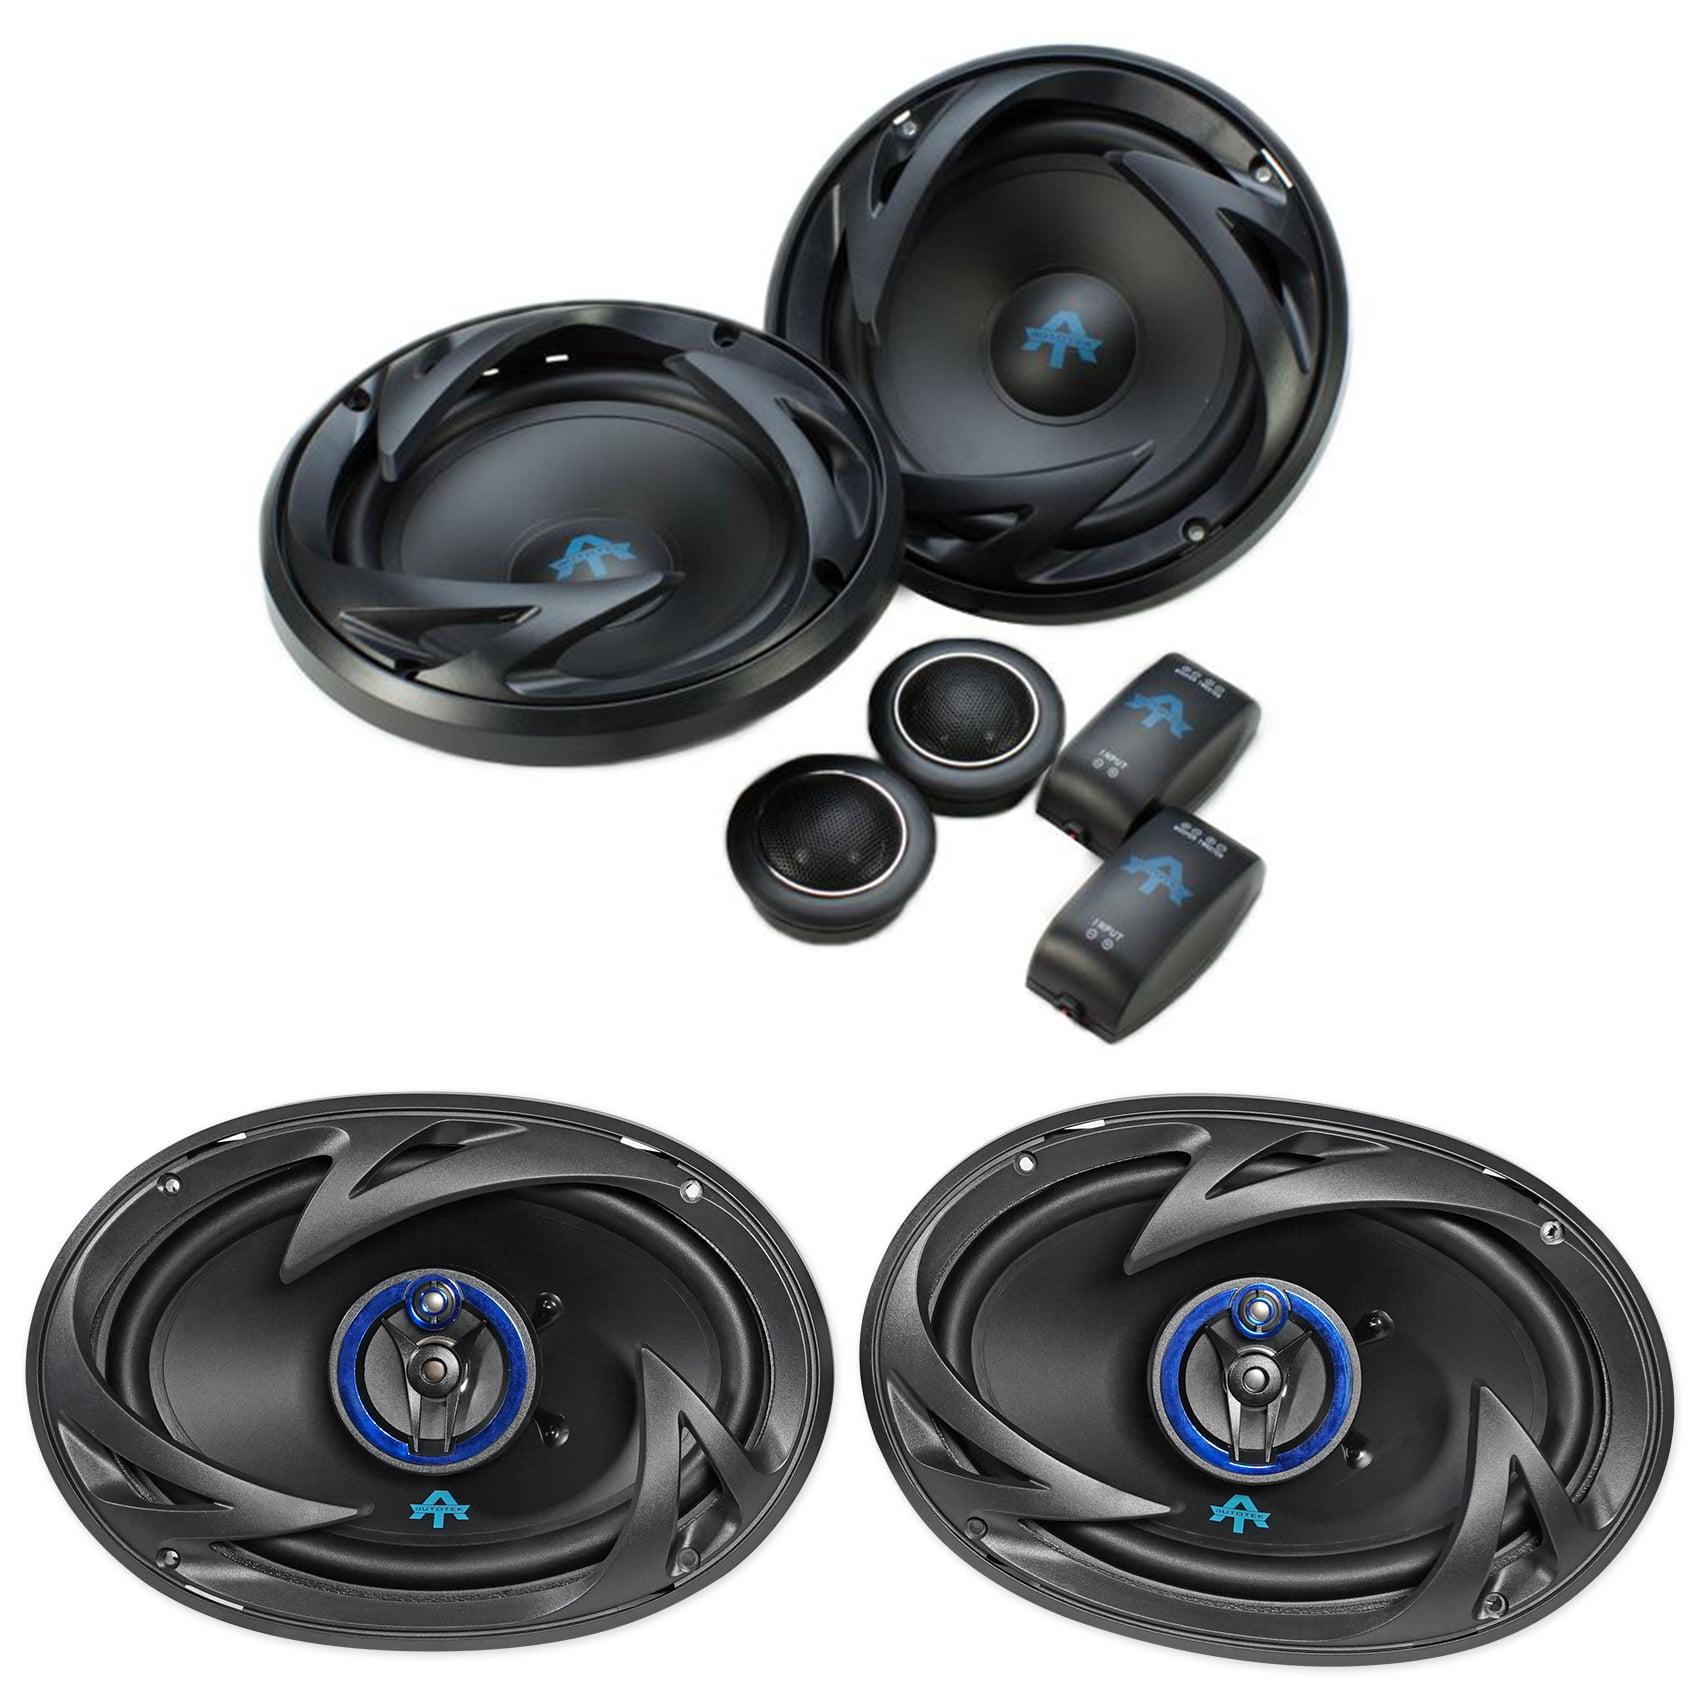 "Pair AUTOTEK ATS65C 6.5"" 600w Component Speakers+Pair ATS693 6x9"" 800w Speakers"